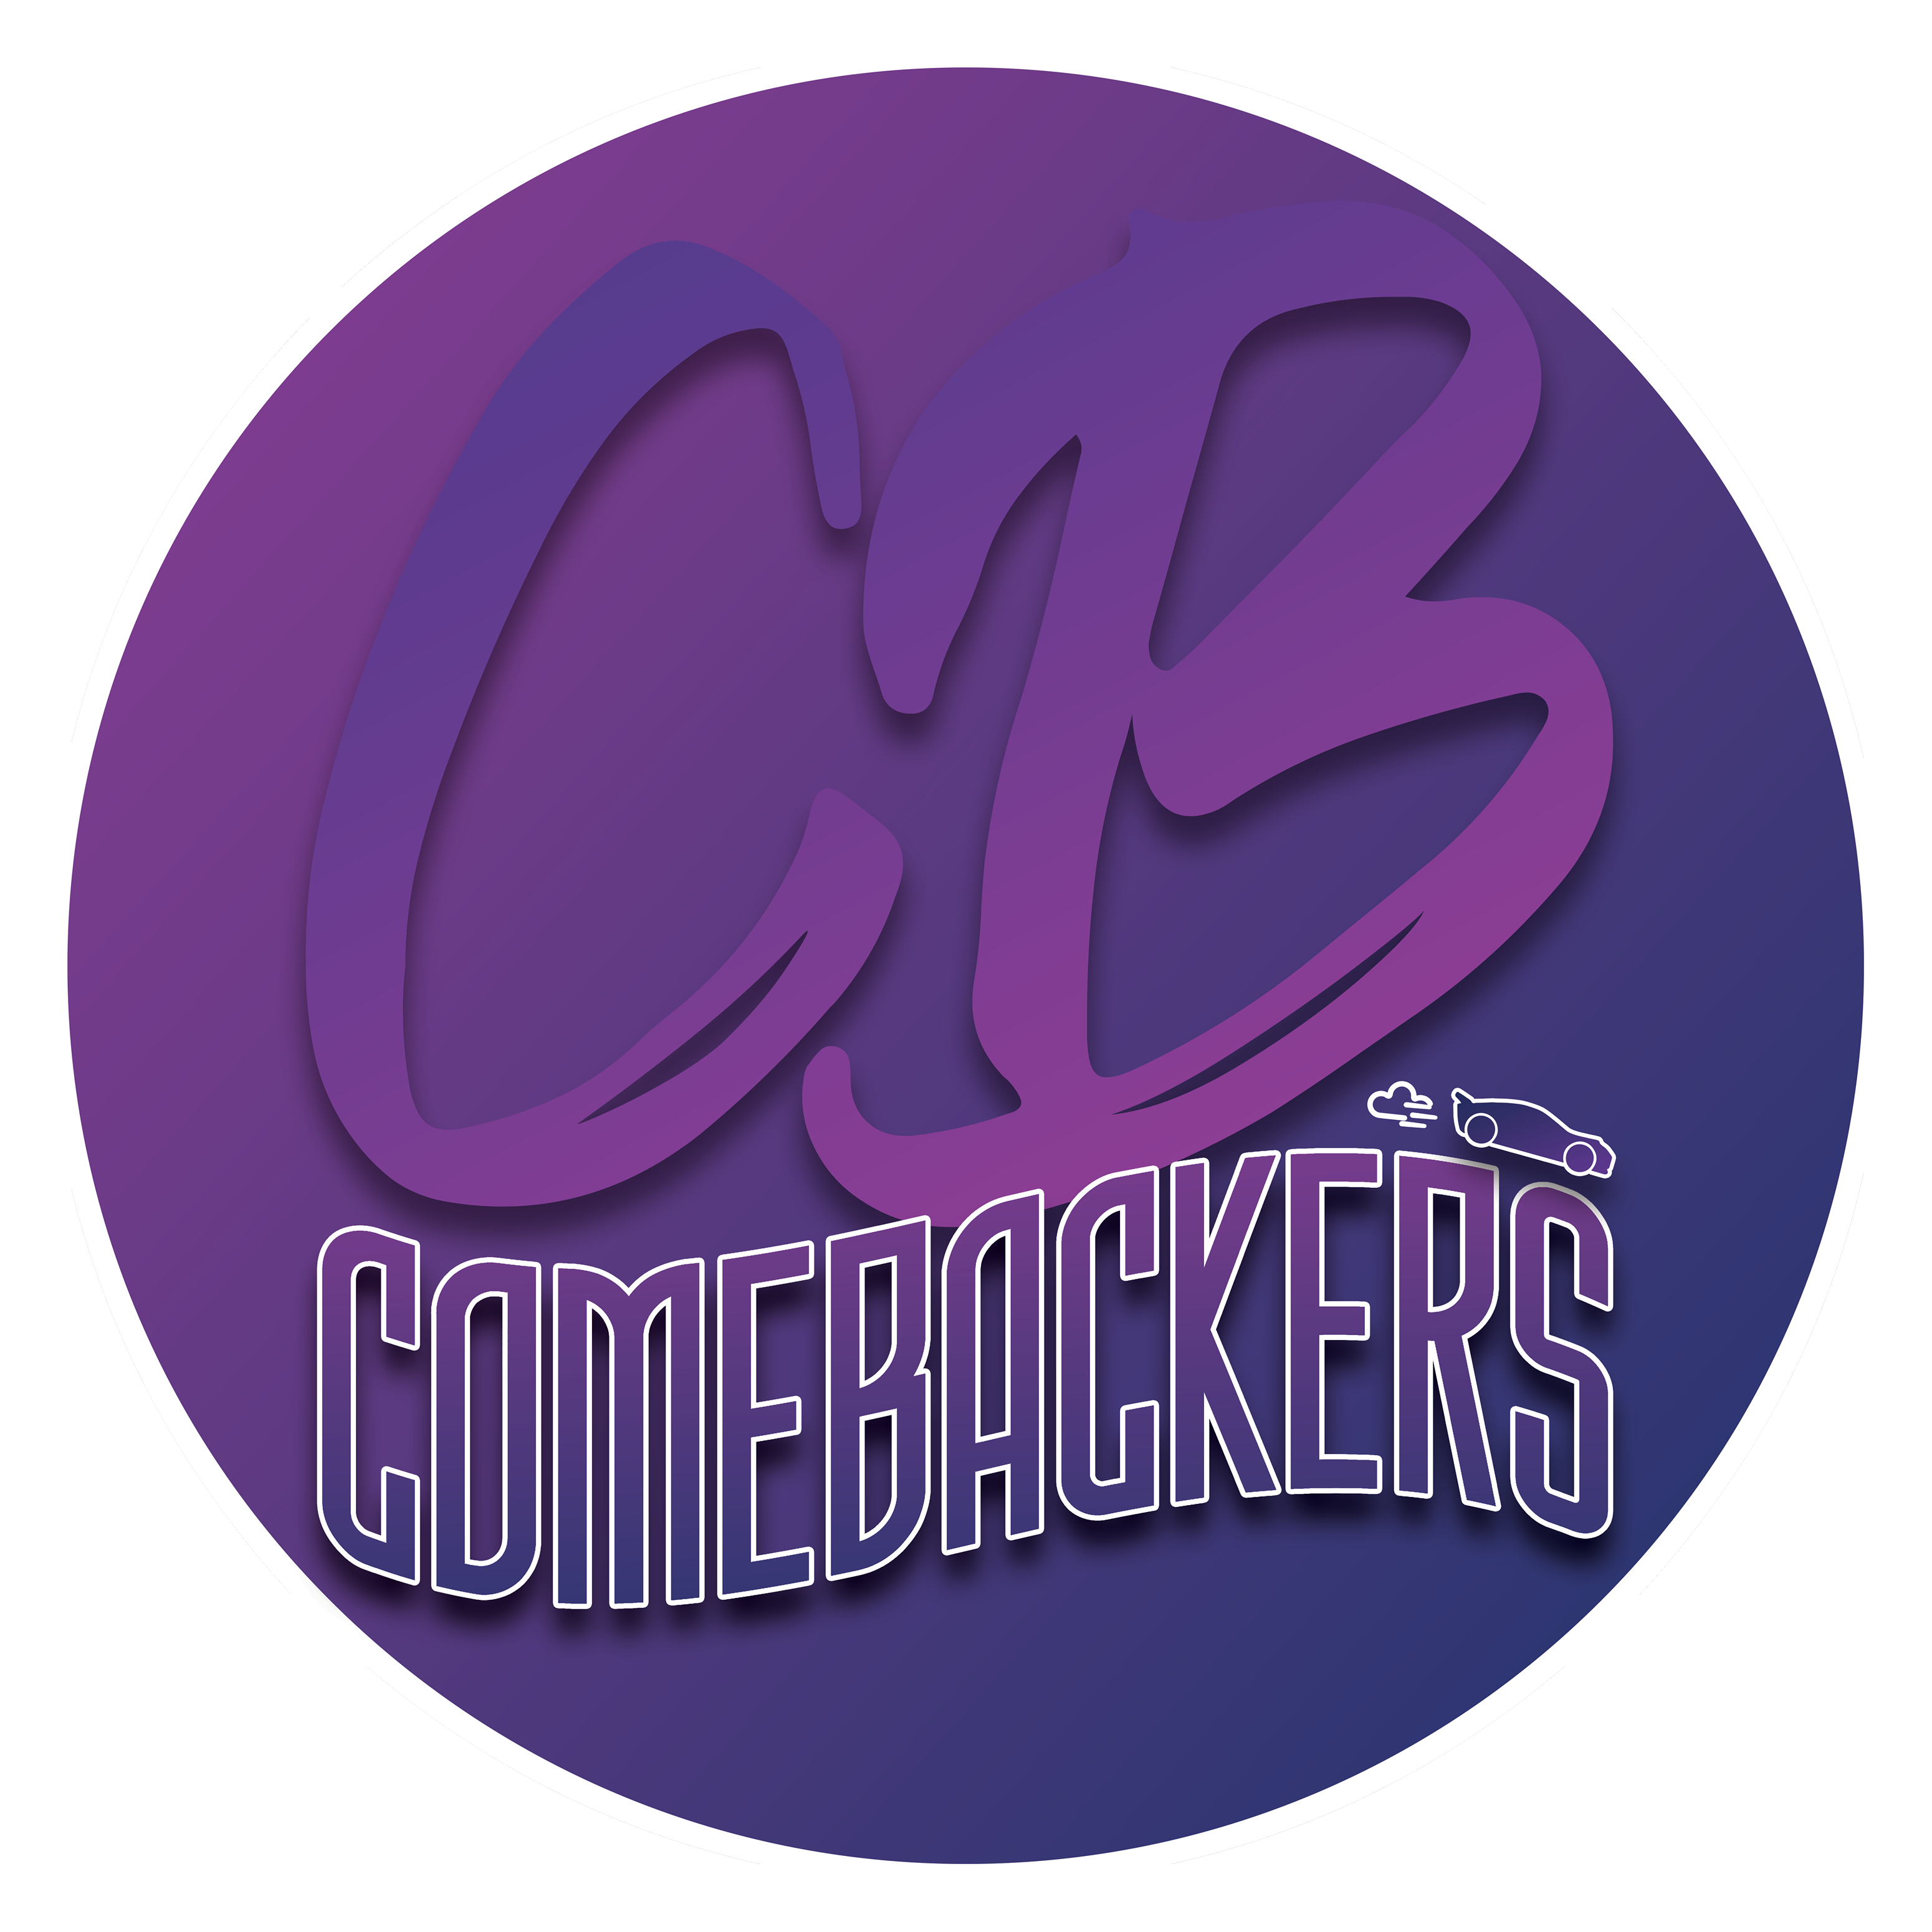 Comebackers